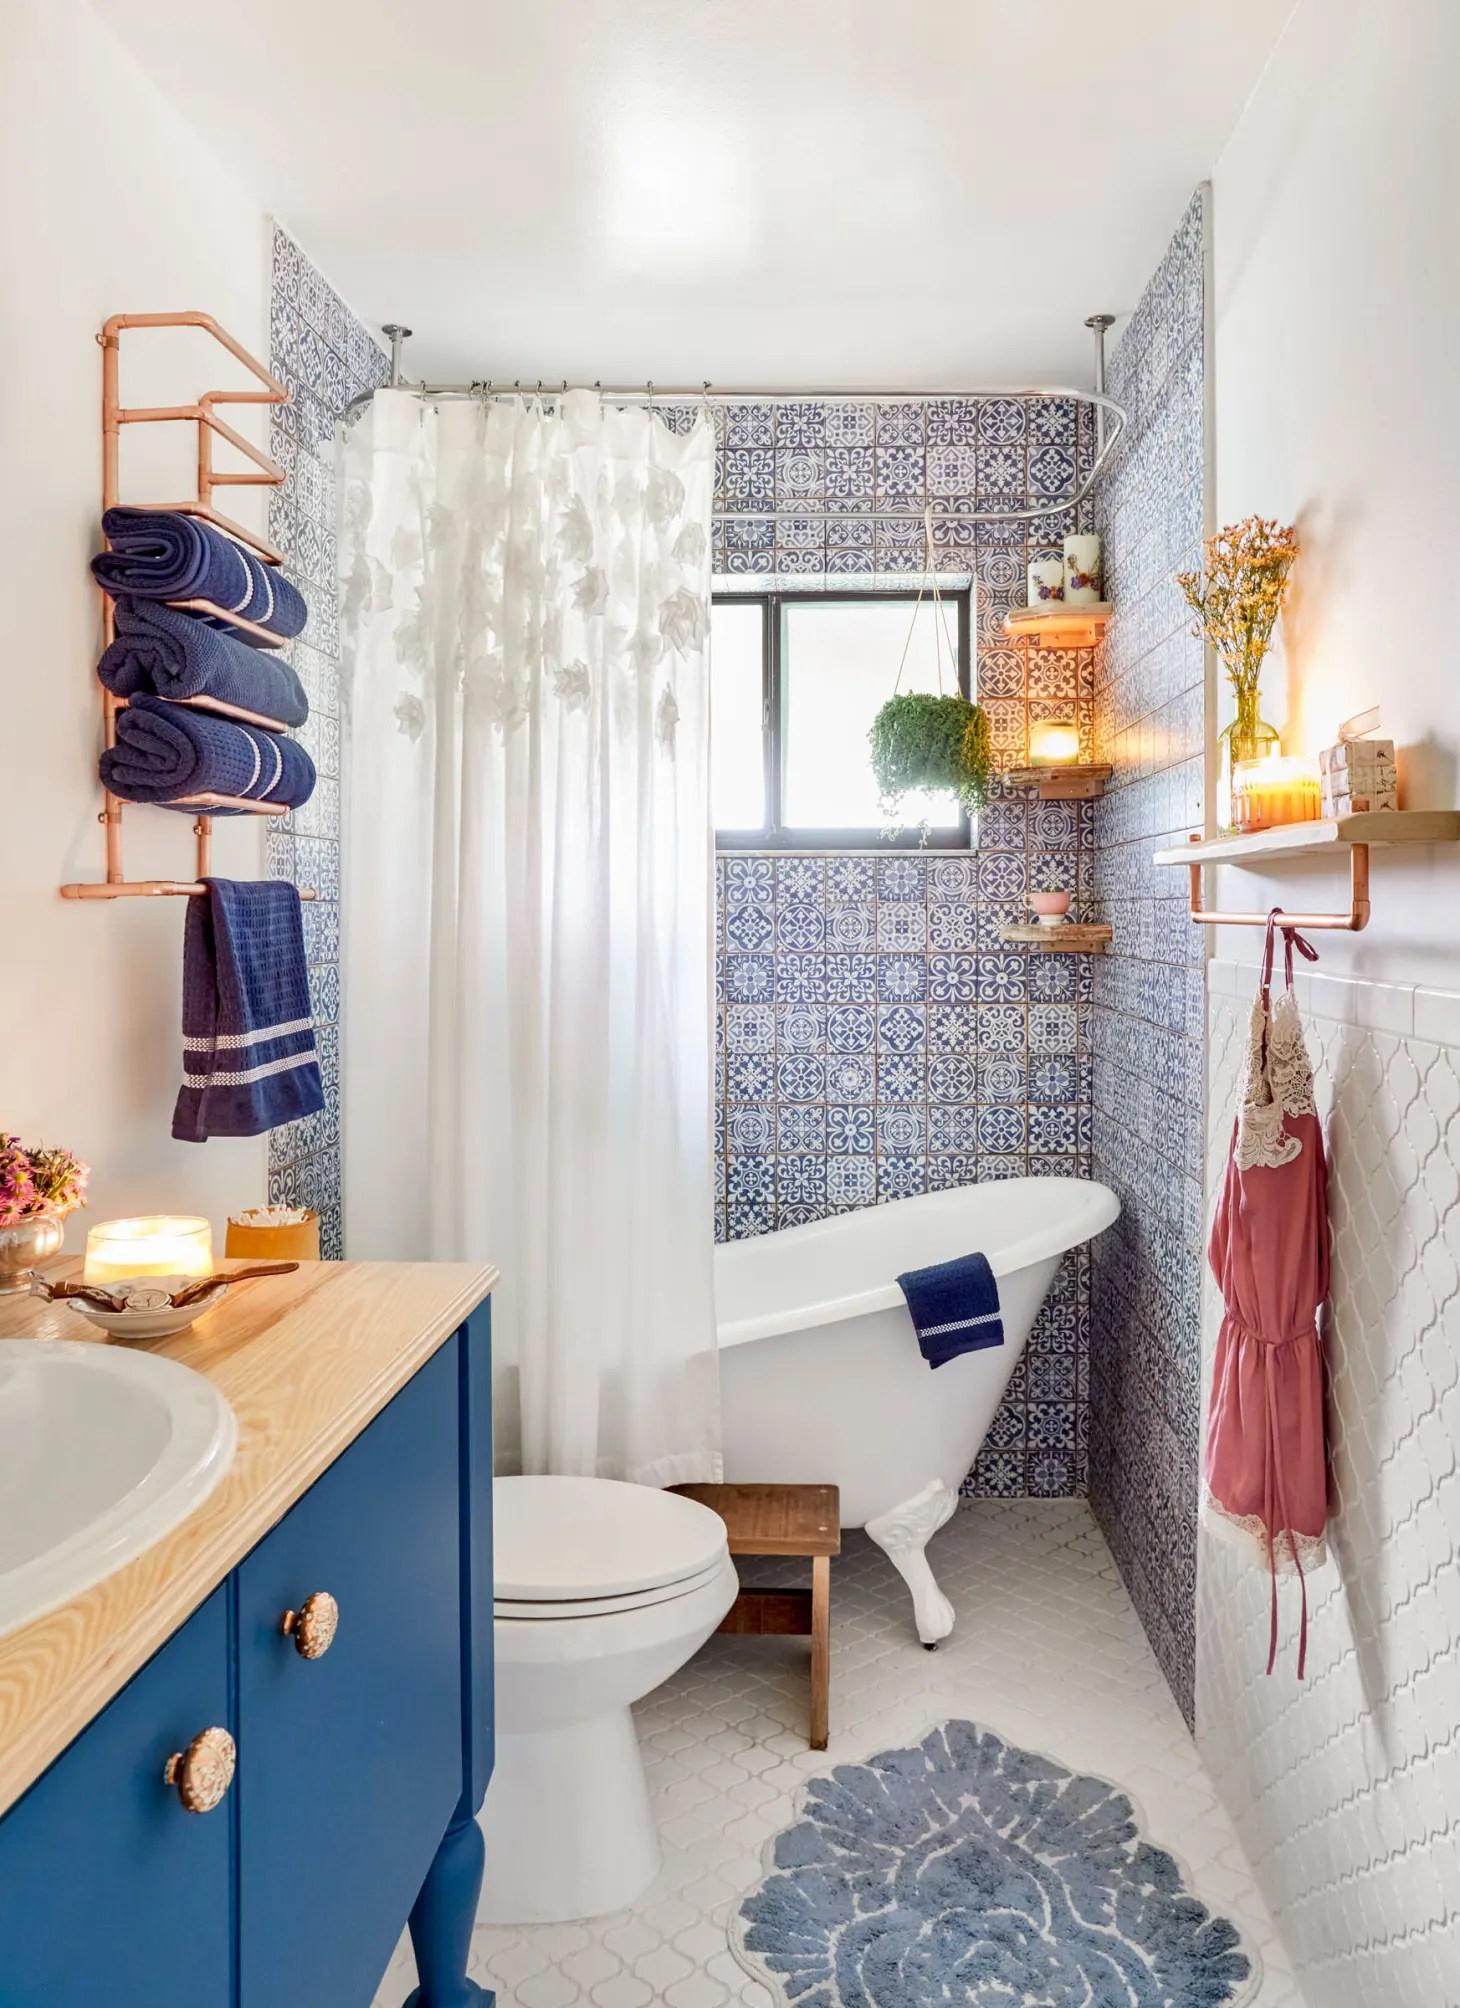 50 Best Small Bathroom Decorating Ideas - Tiny Bathroom ... on Small Apartment Bathroom Ideas  id=30852